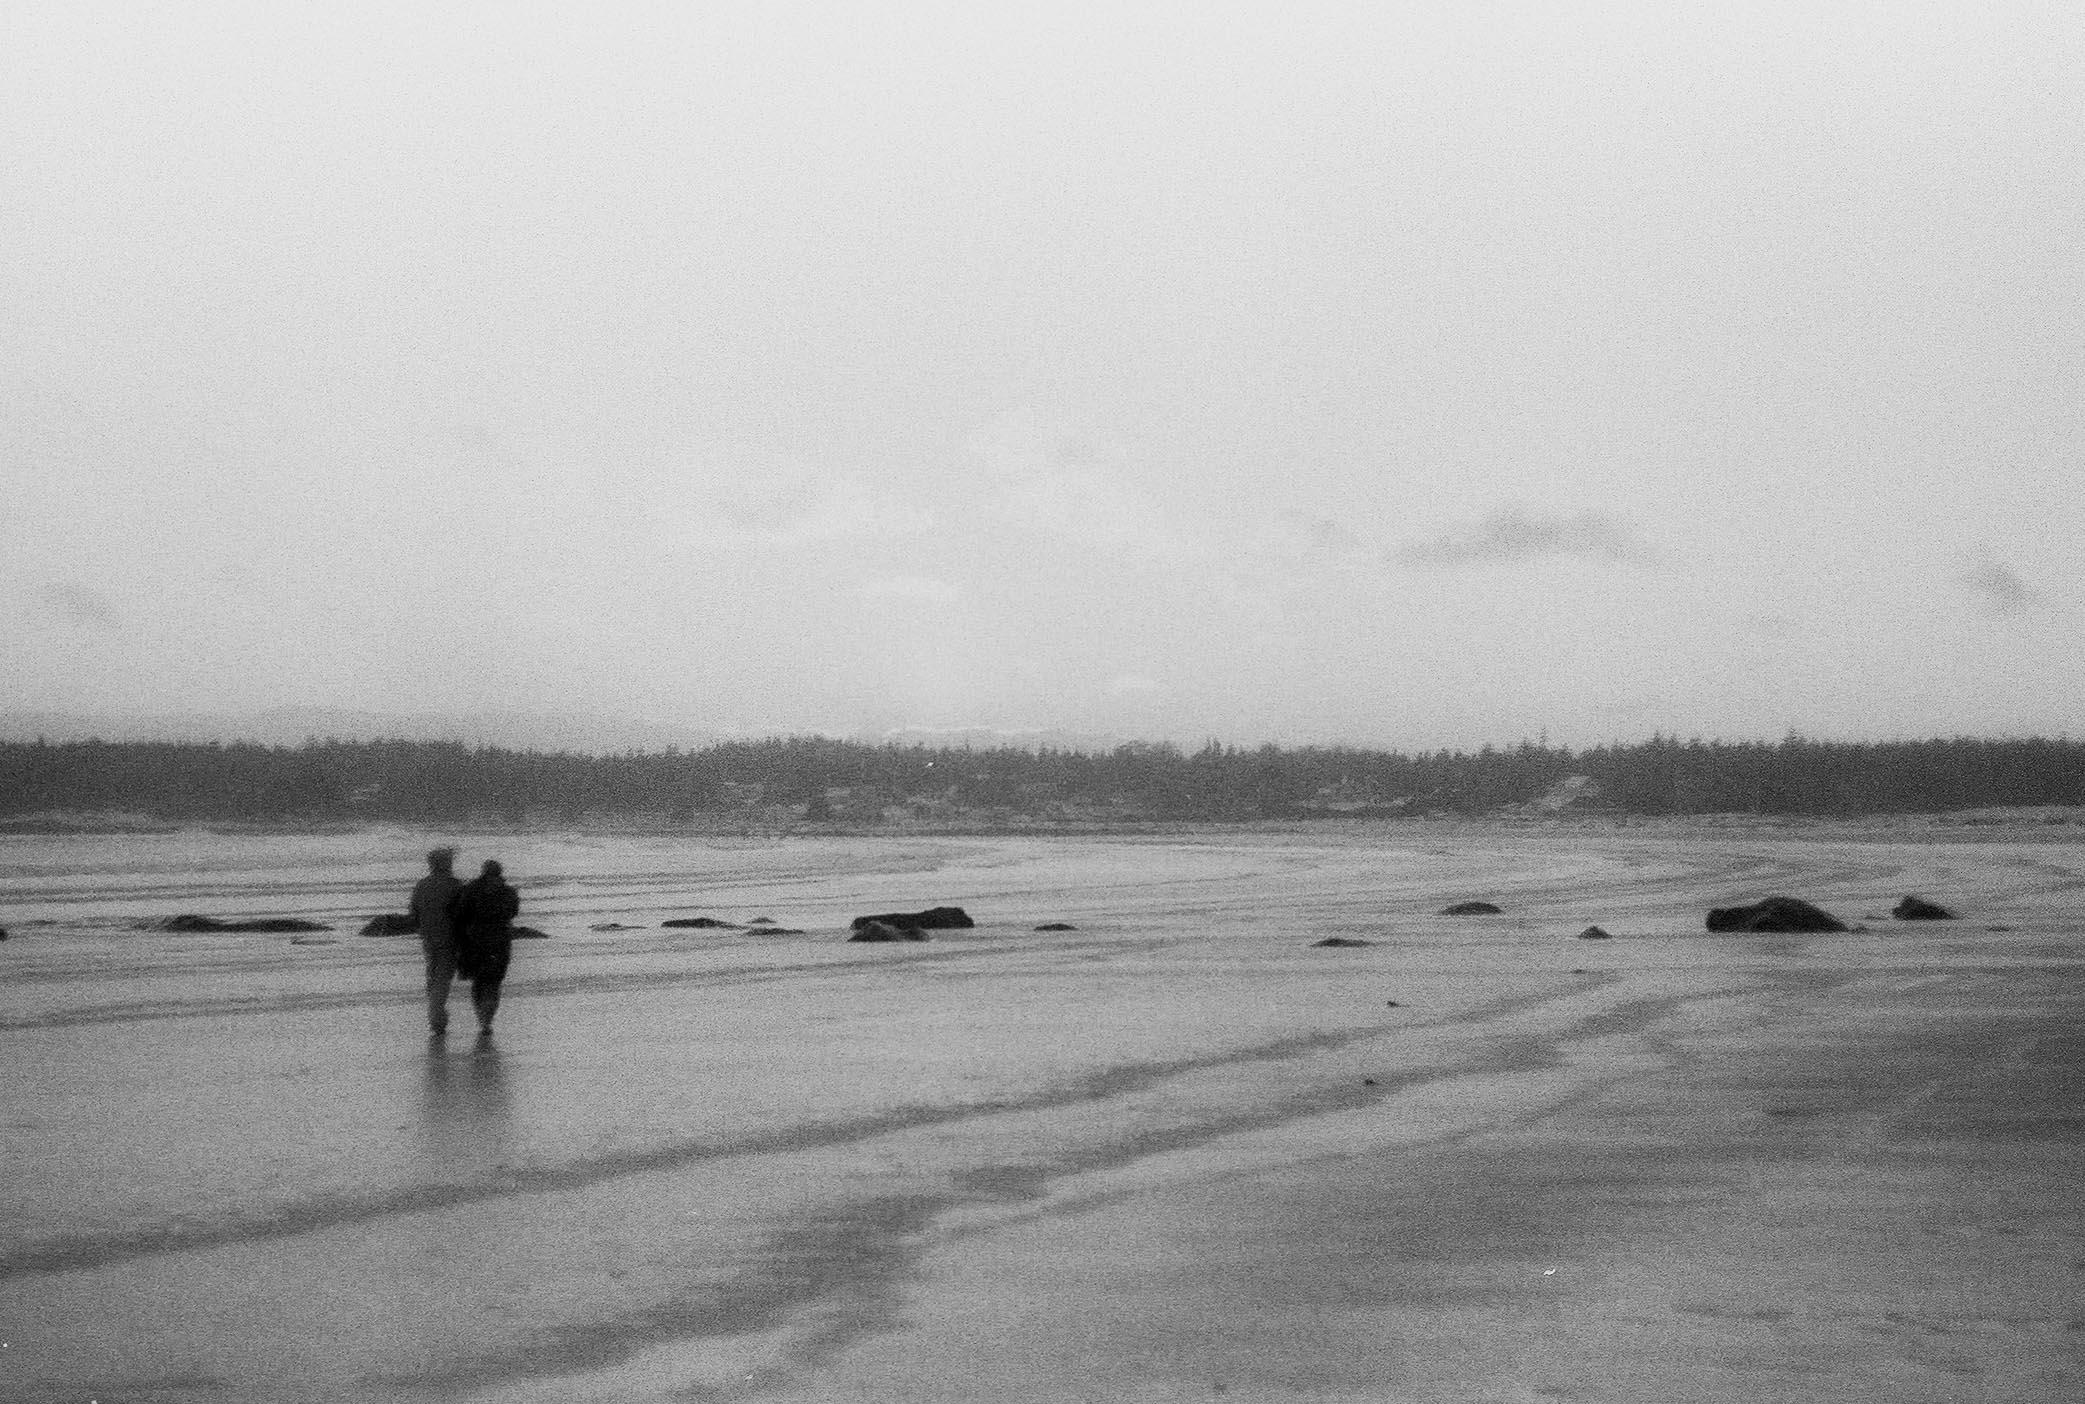 Sandy and Troy walking at Lockeport beach. Valentine's day 2016